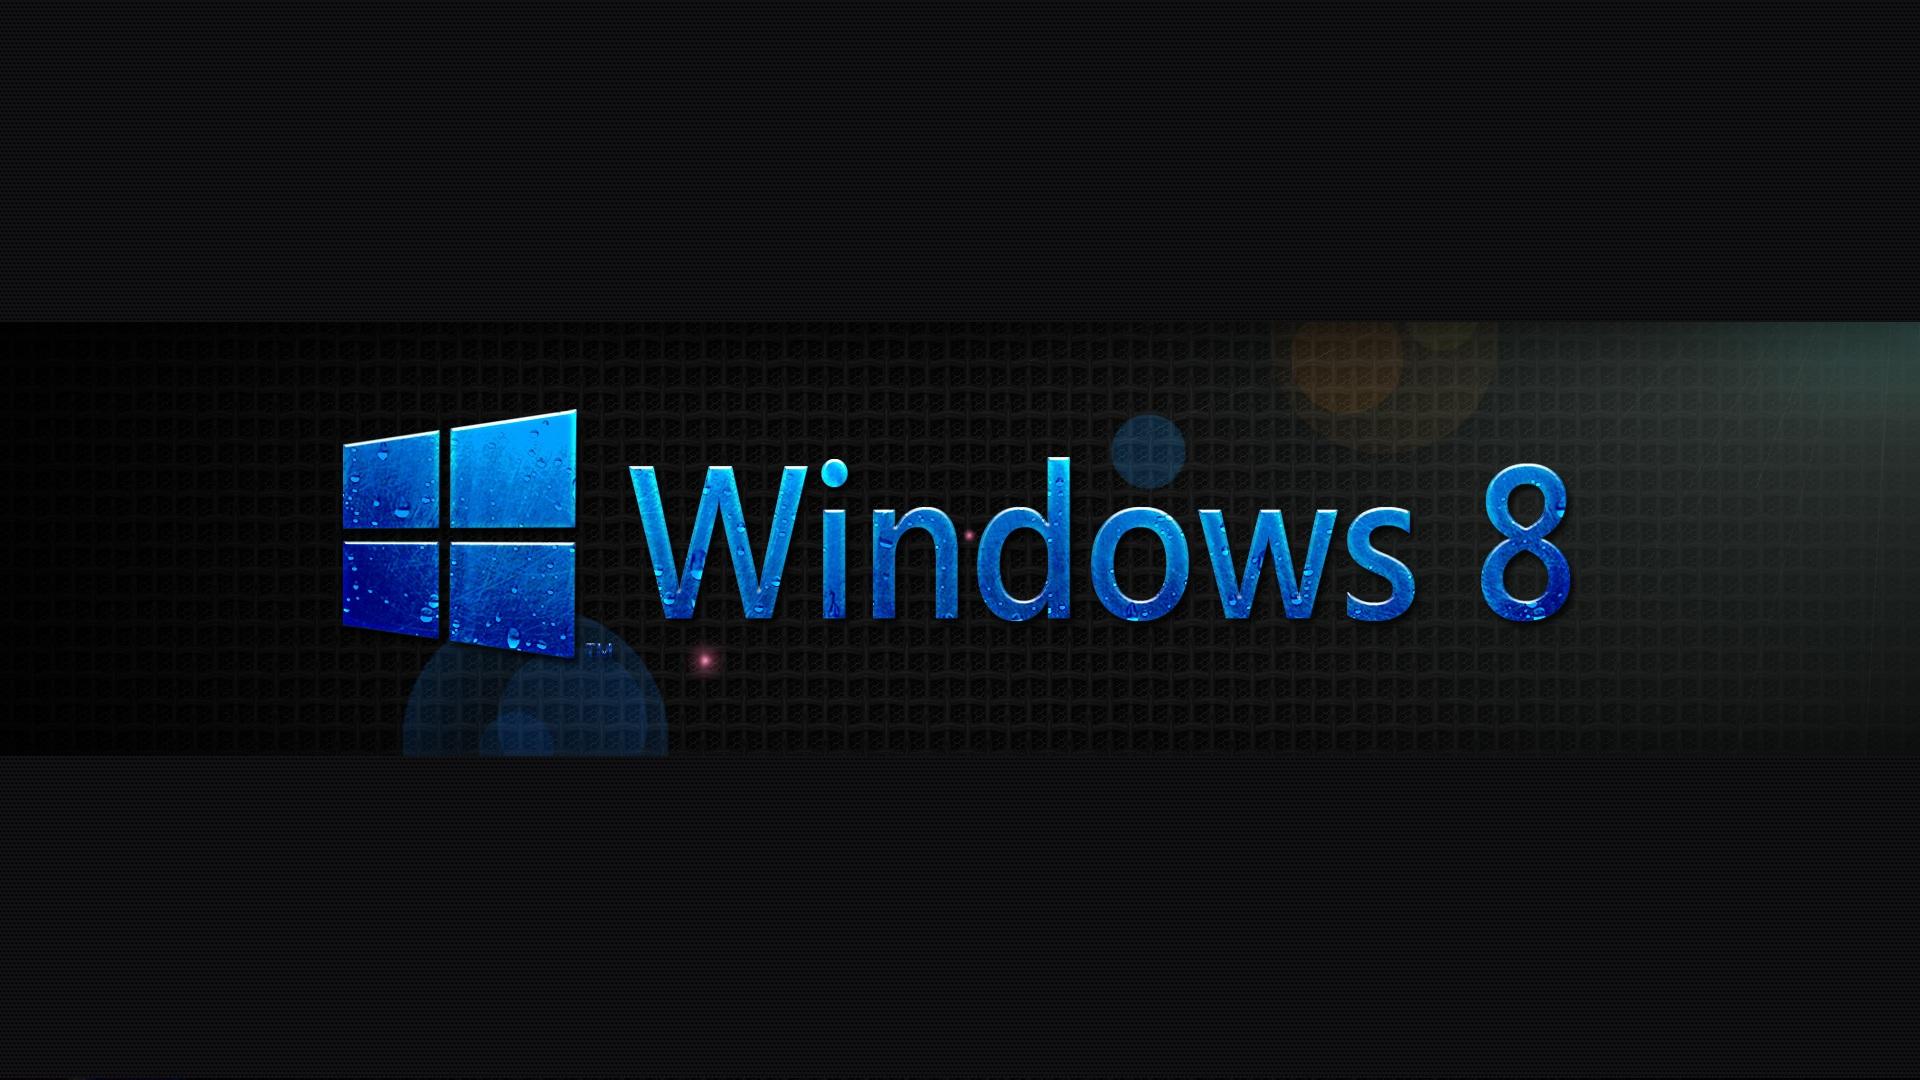 Windows 81 Wallpaper Hd 1080P wallpaper   1424716 1920x1080